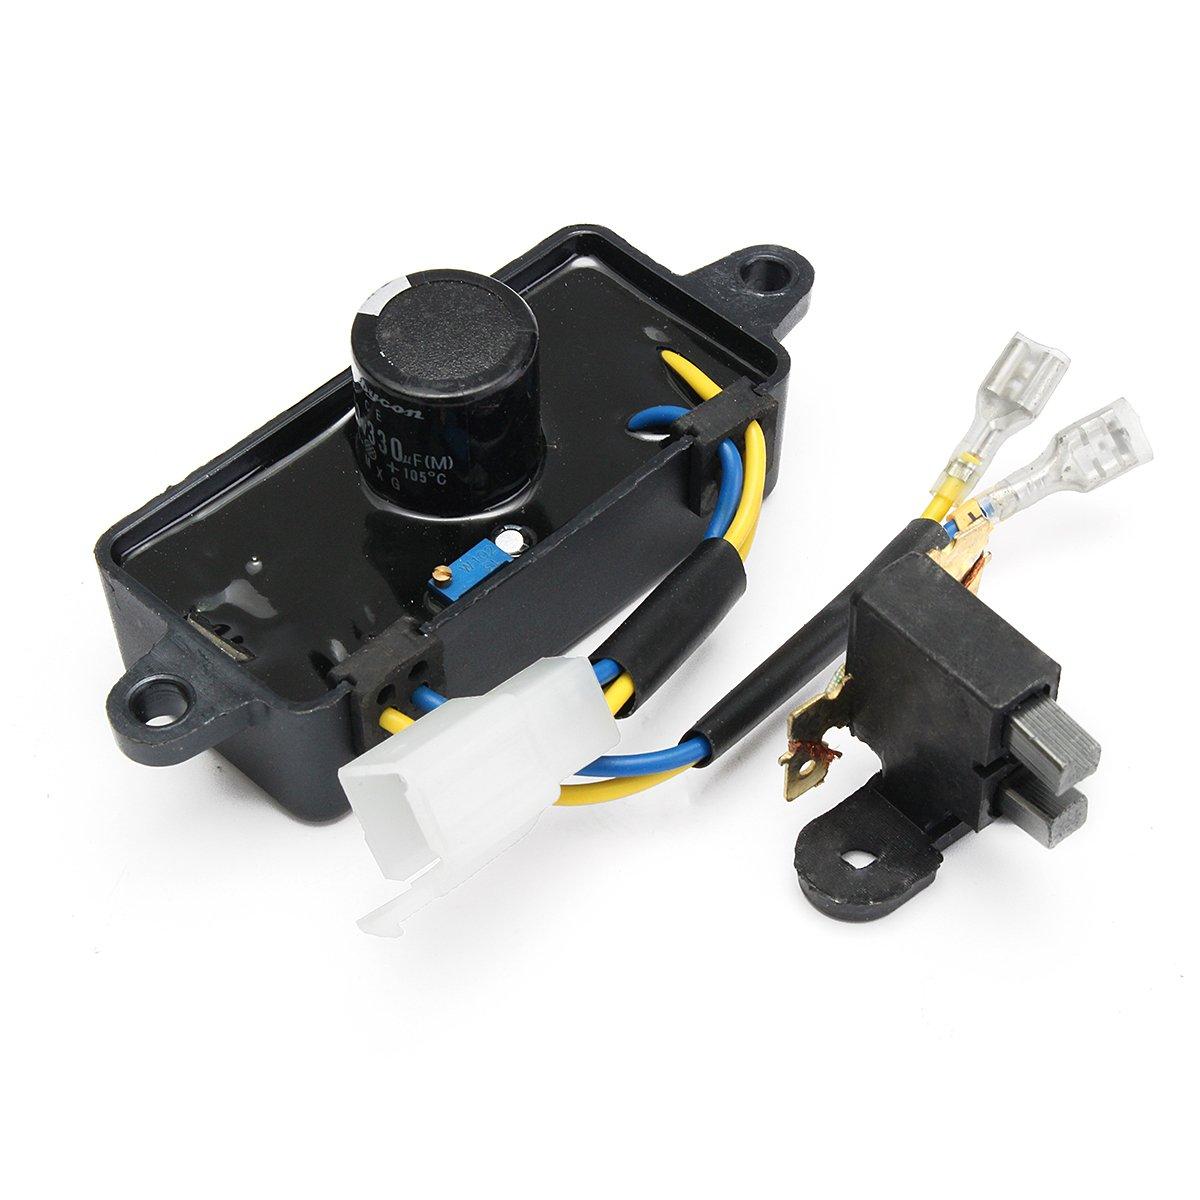 MASUNN 2-3KW Rectangle Automatic Voltage Regulator Rectifier Petrol Generator